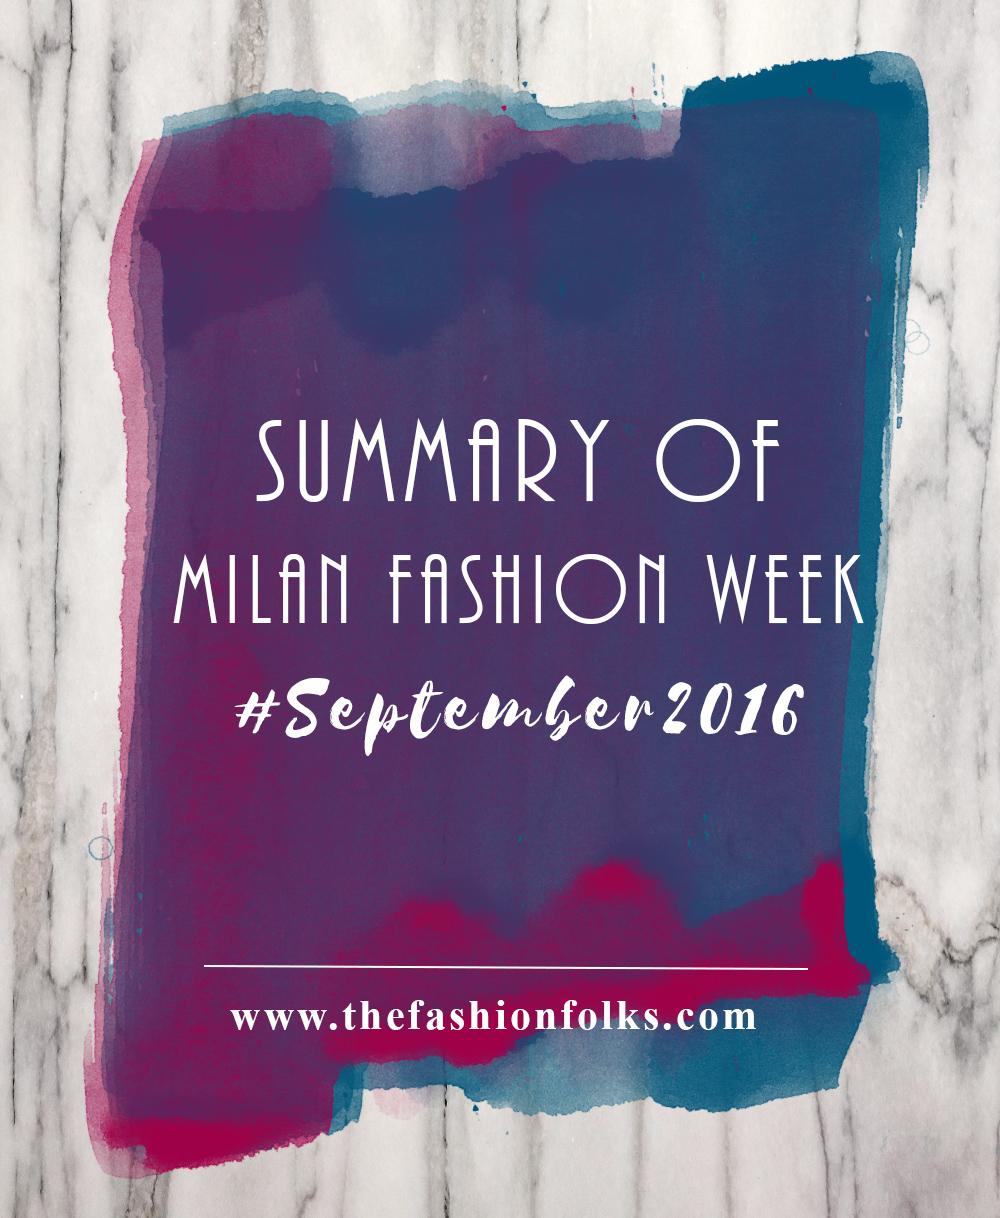 Summary Of Milan Fashion Week September 2016   The Fashion Folks